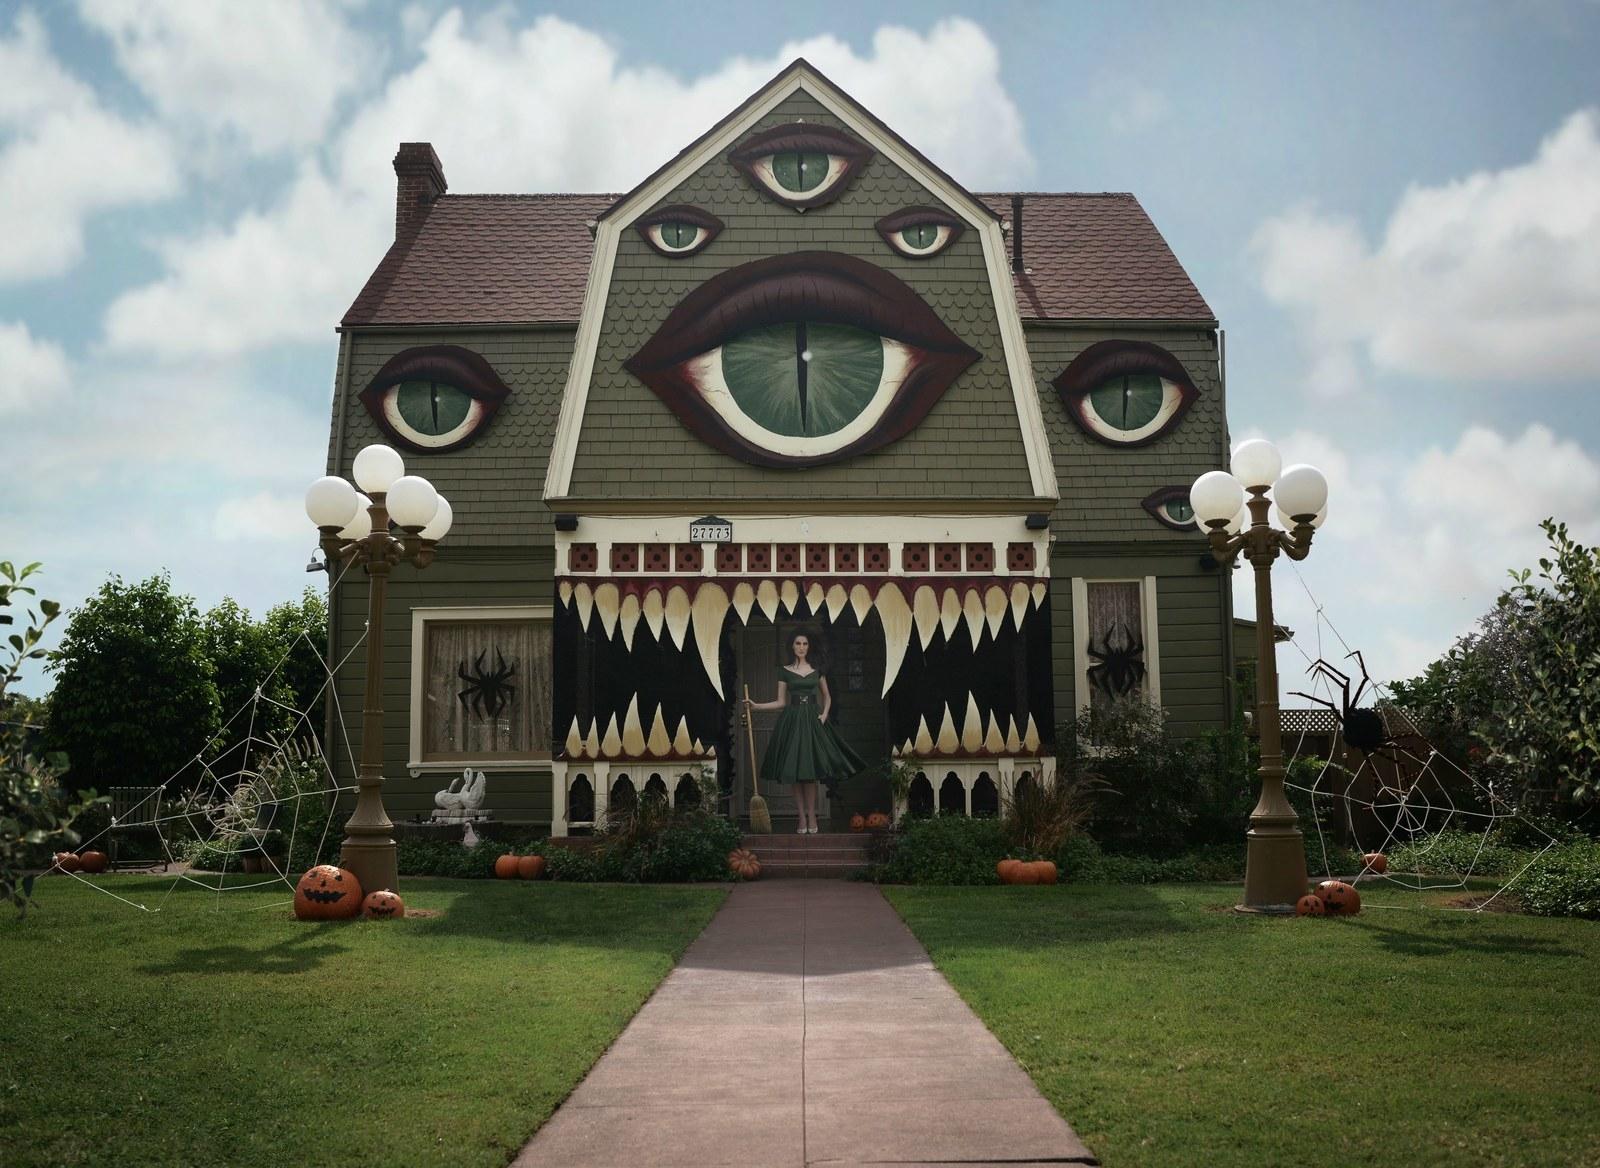 Buzzfeed Halloween Decorations Part - 39: Halloween Decorations In America: